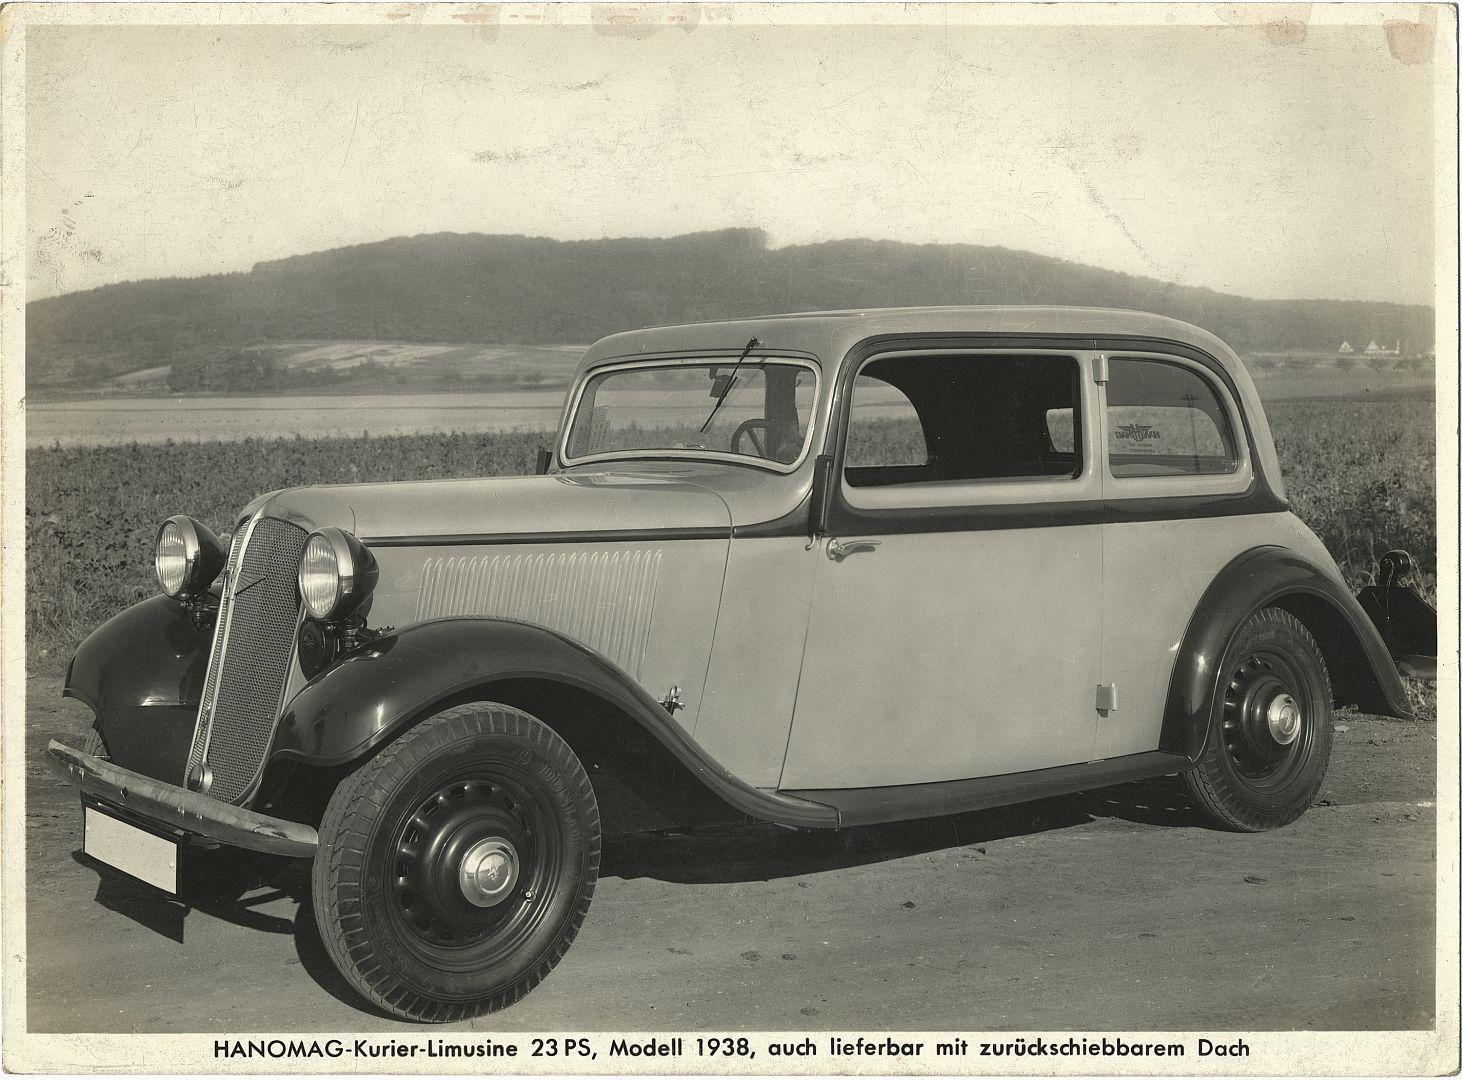 Hanomag_Kurier_Limousine_Pressefoto_1938